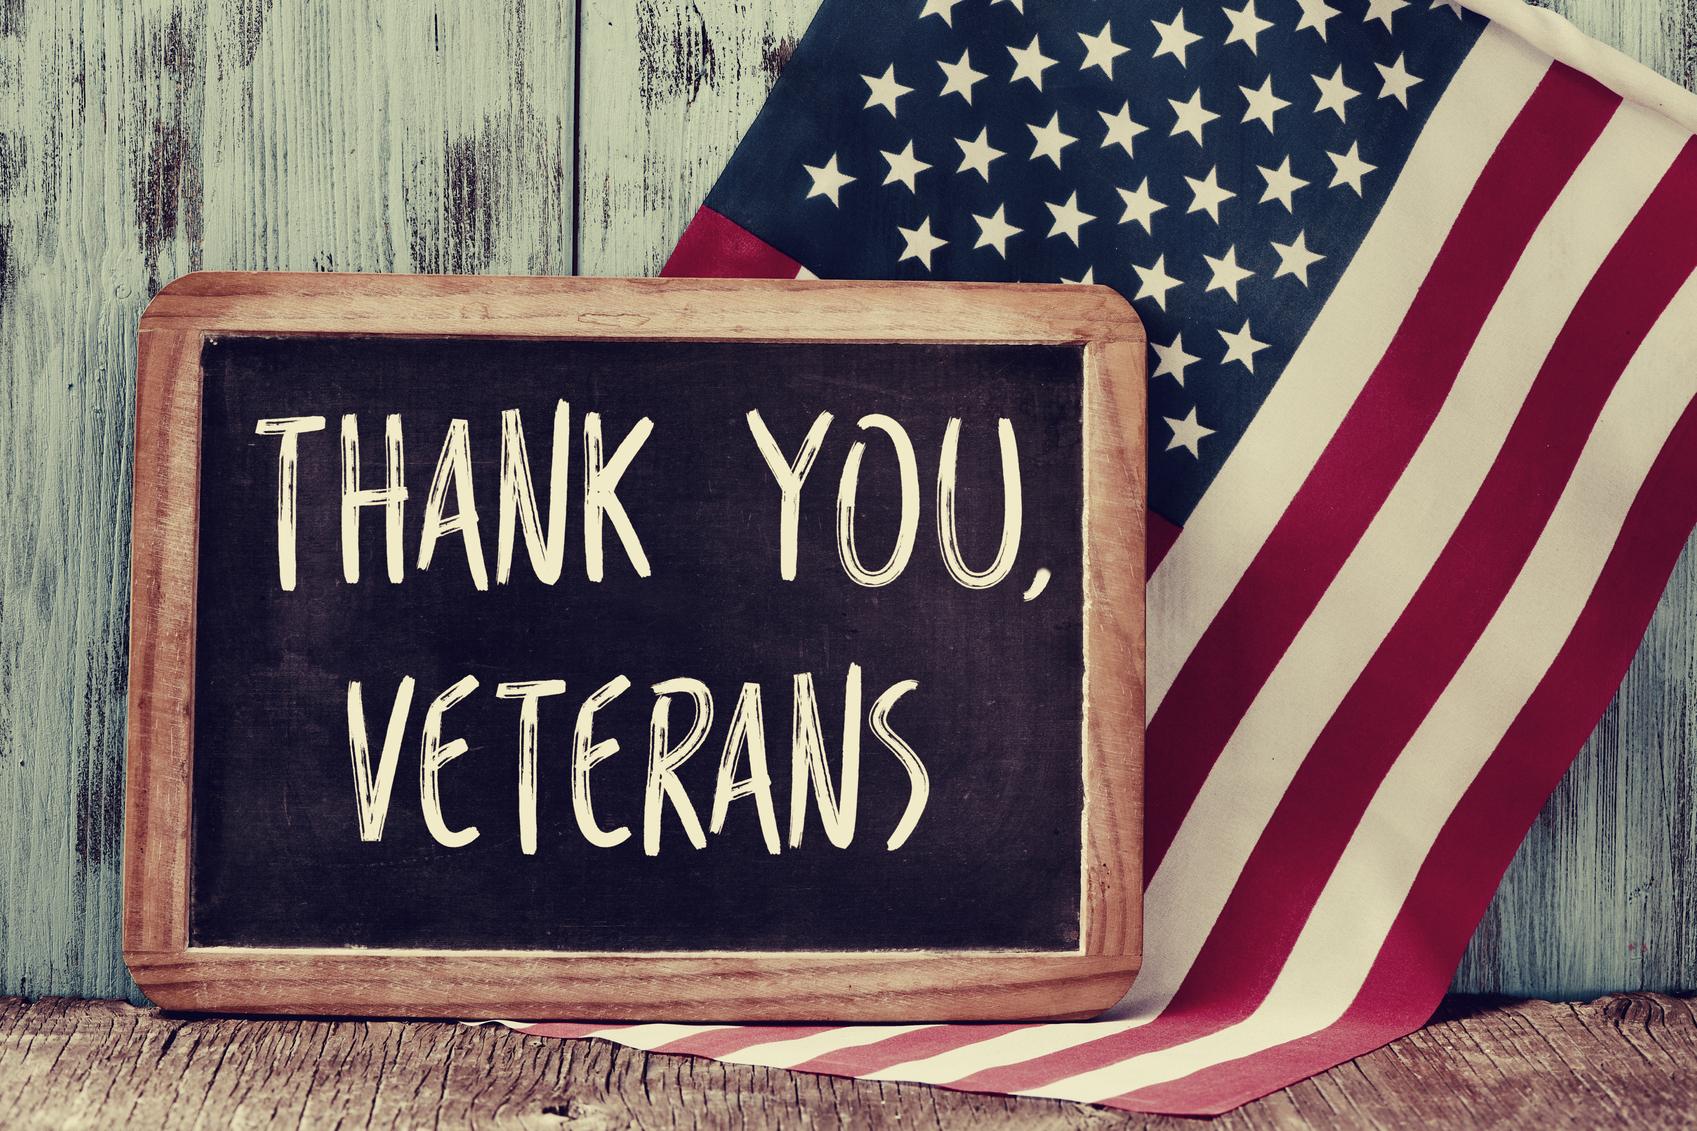 I-HELP Helping Veterans in Need